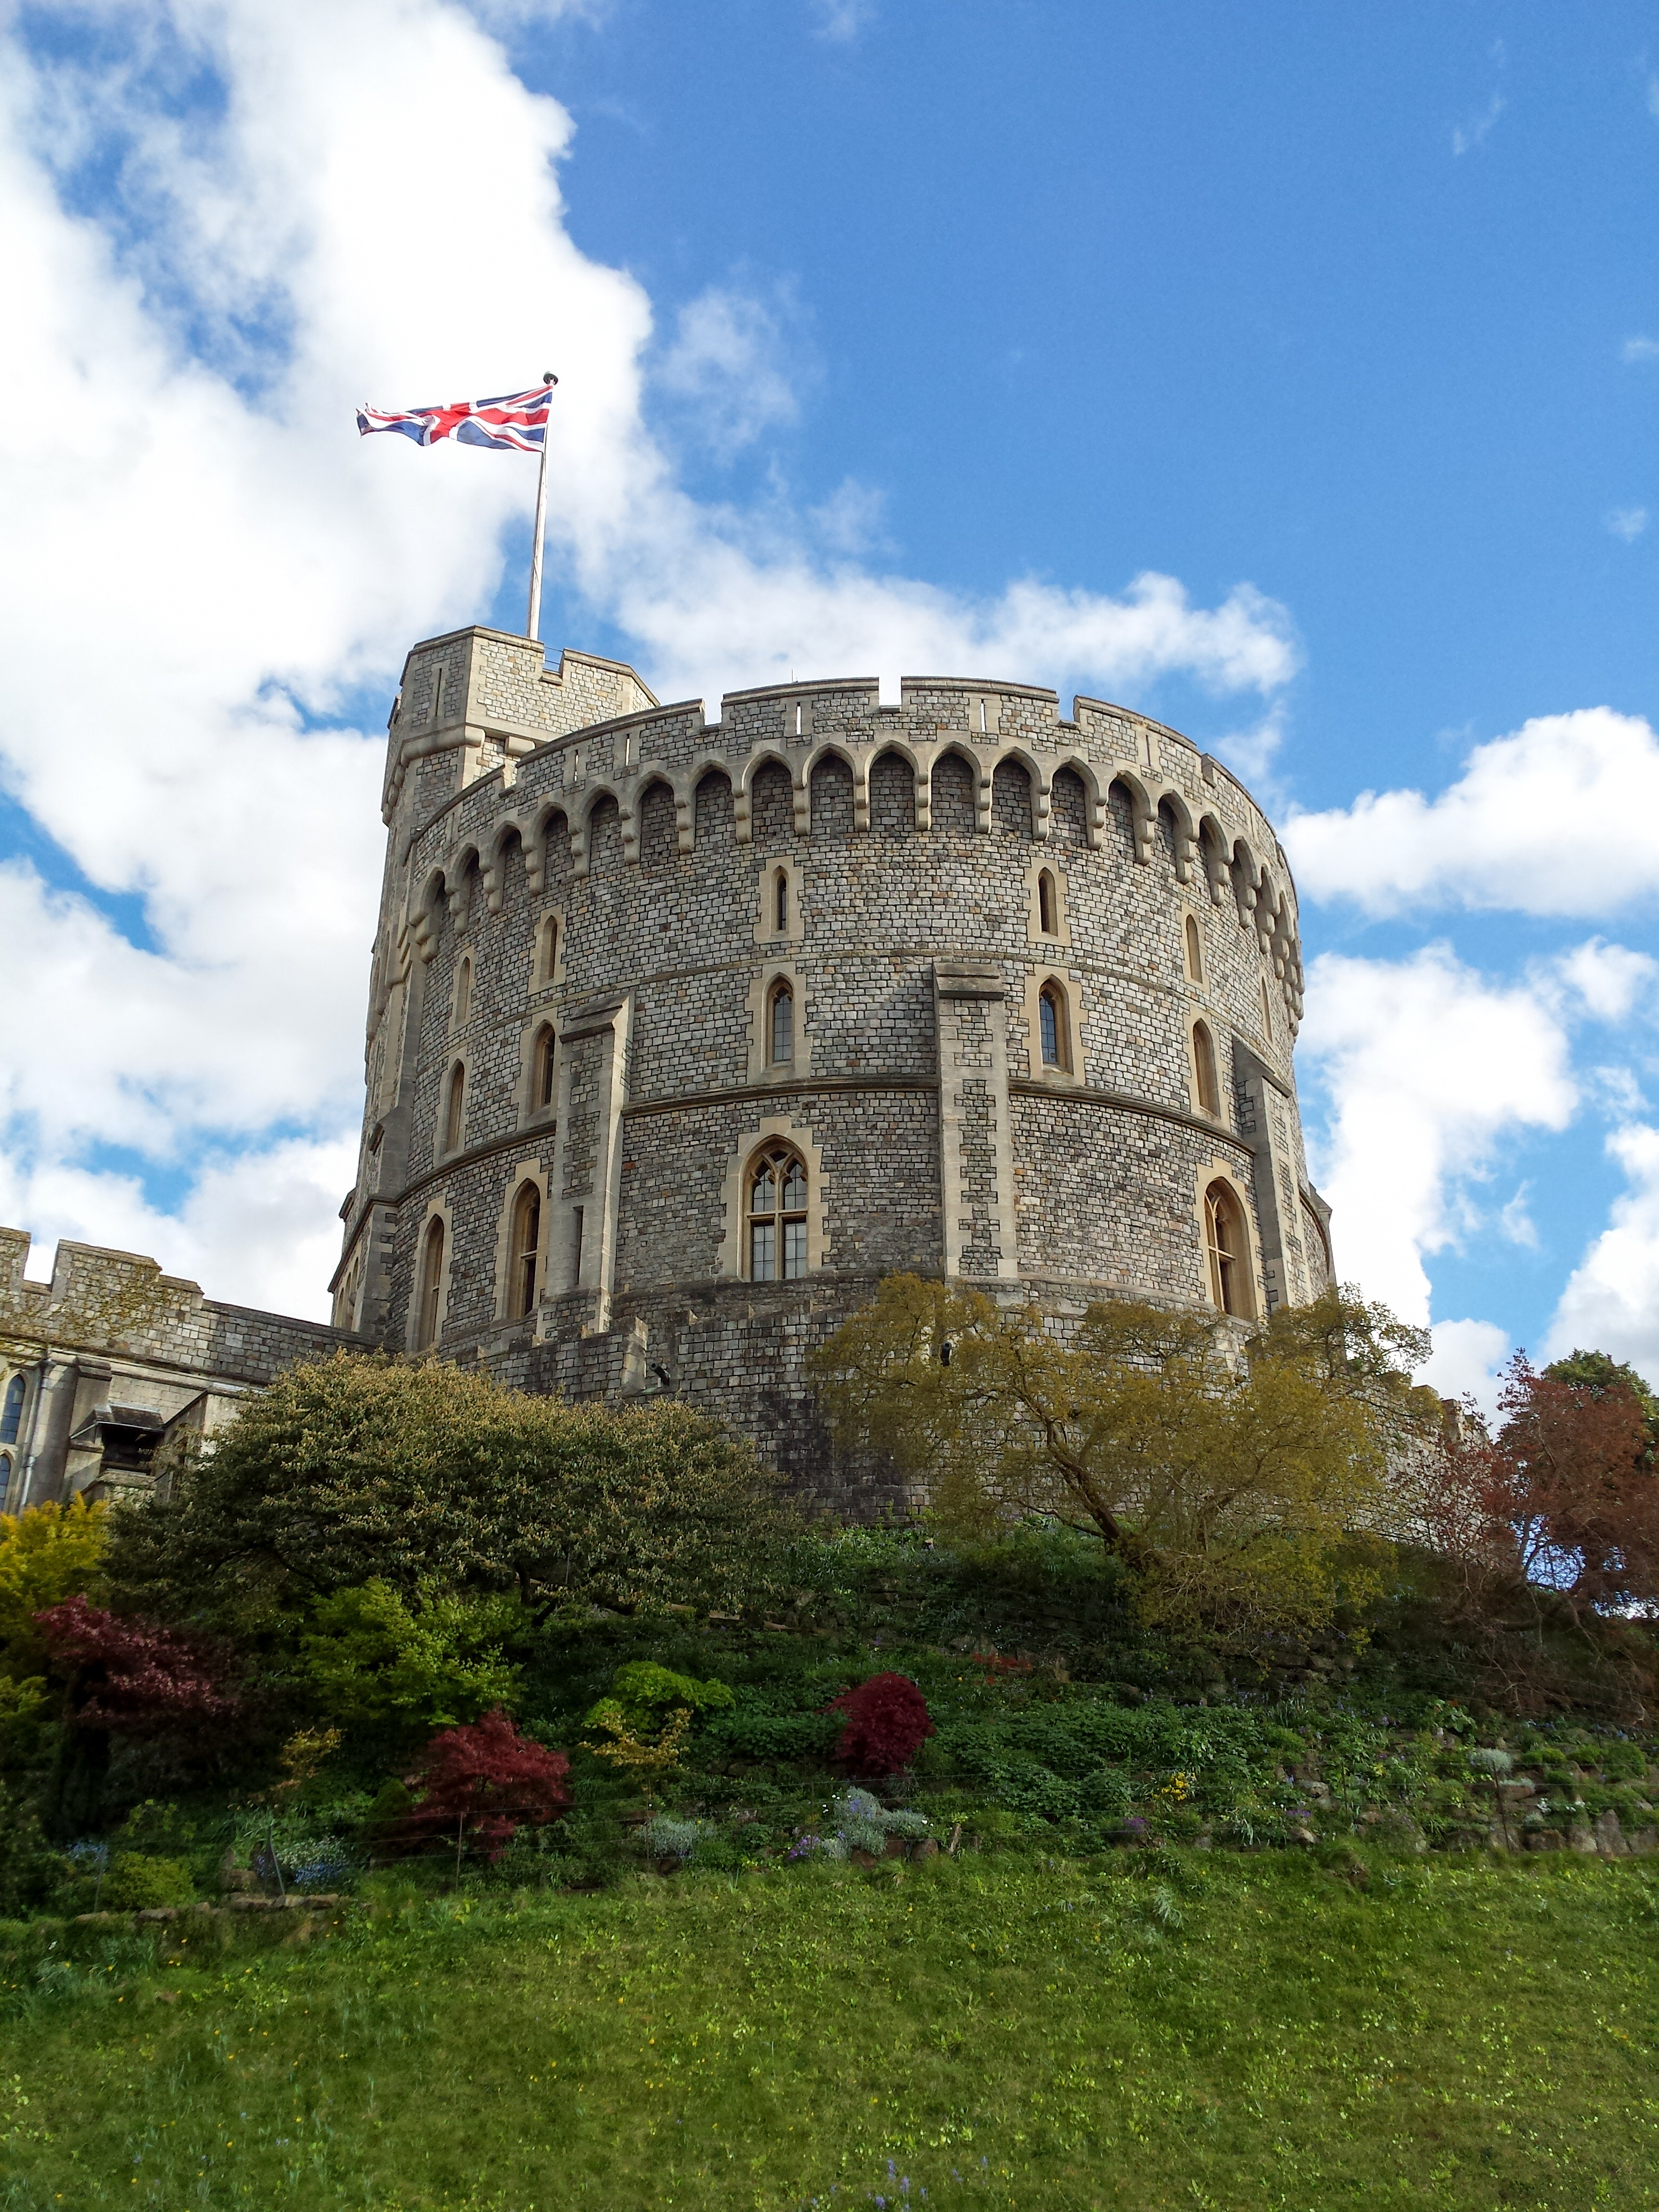 filewindsor castle 2015 05 09jpg